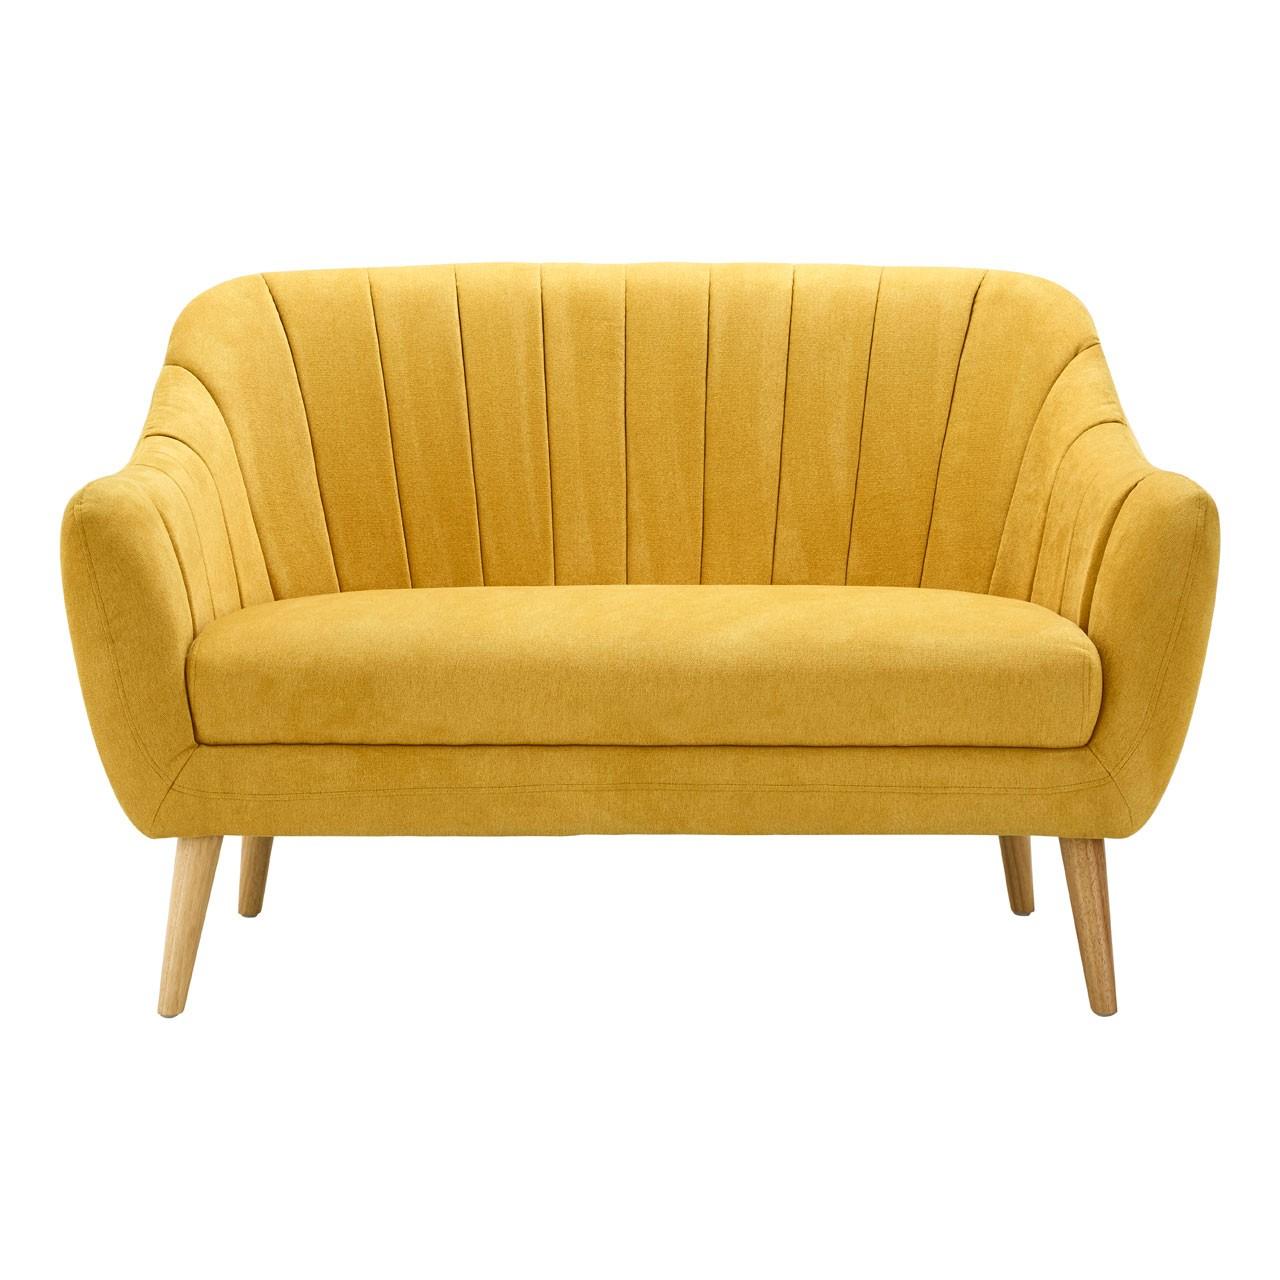 Gottenberg 2 Seater Sofa Yellow